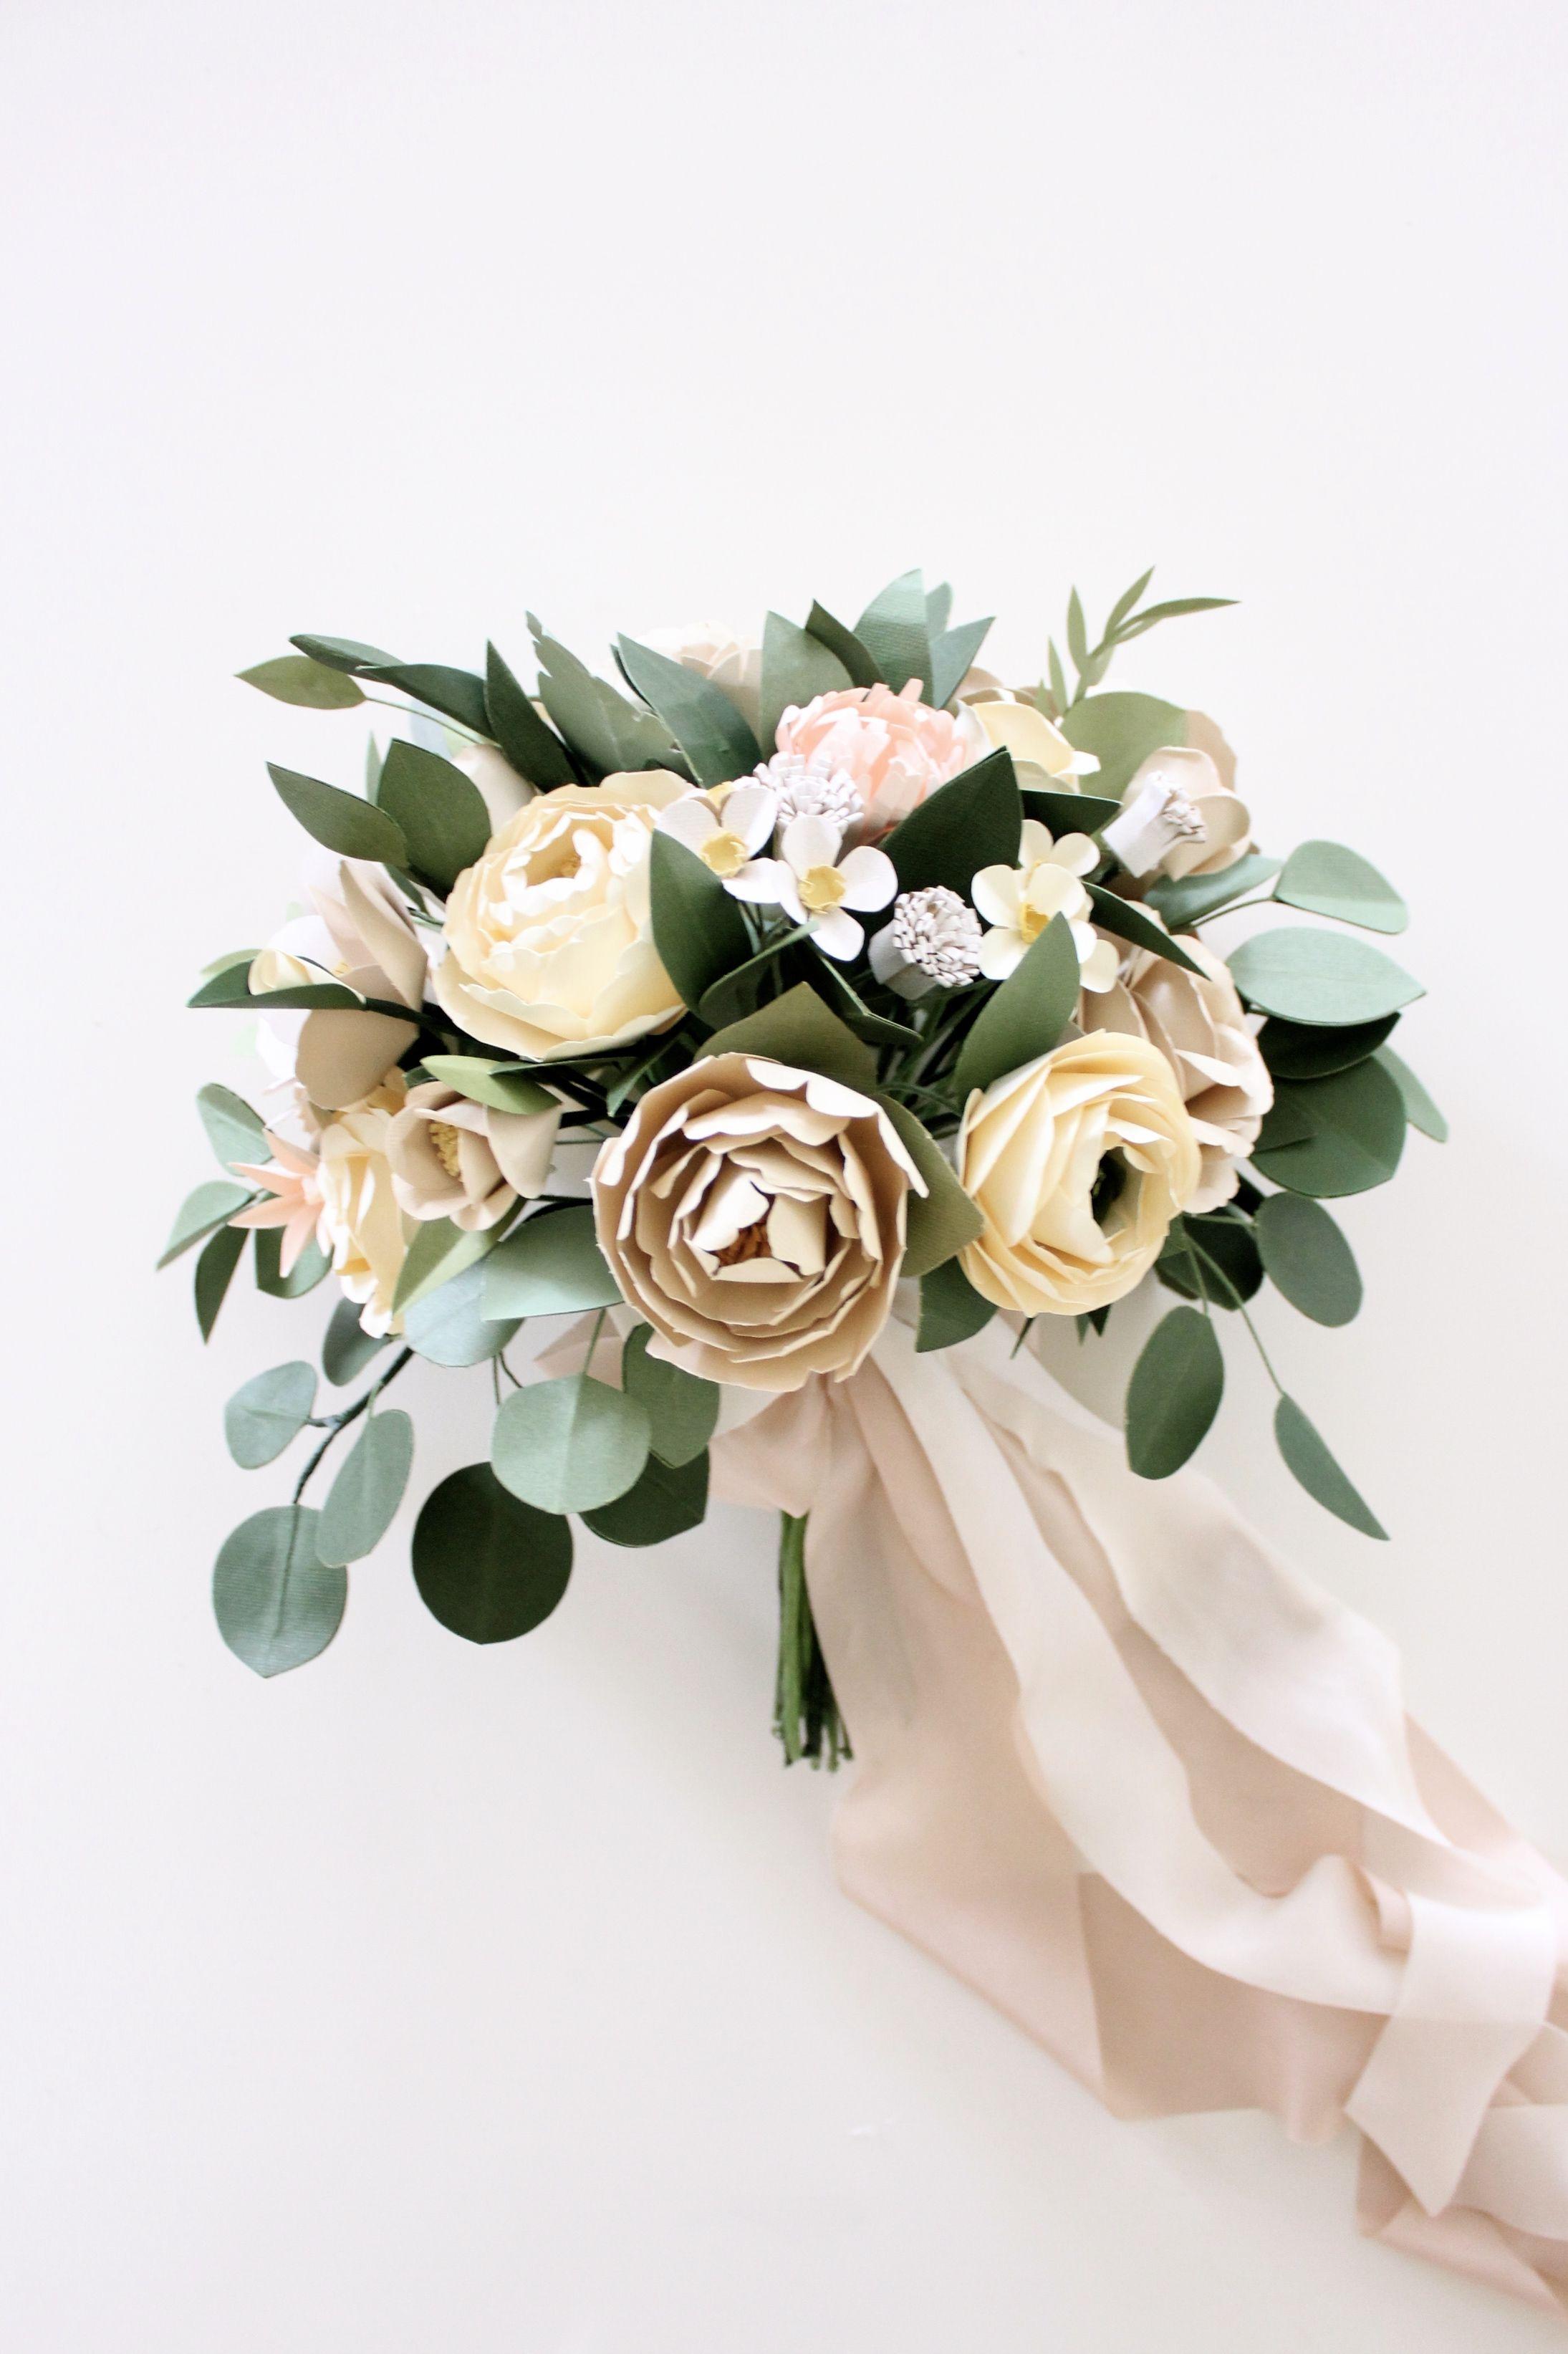 Customized bridal bouquet paper flowers pinterest paper paper flower bridal bouquet handmade by sara kim paper flowers wedding flower bouquet wedding izmirmasajfo